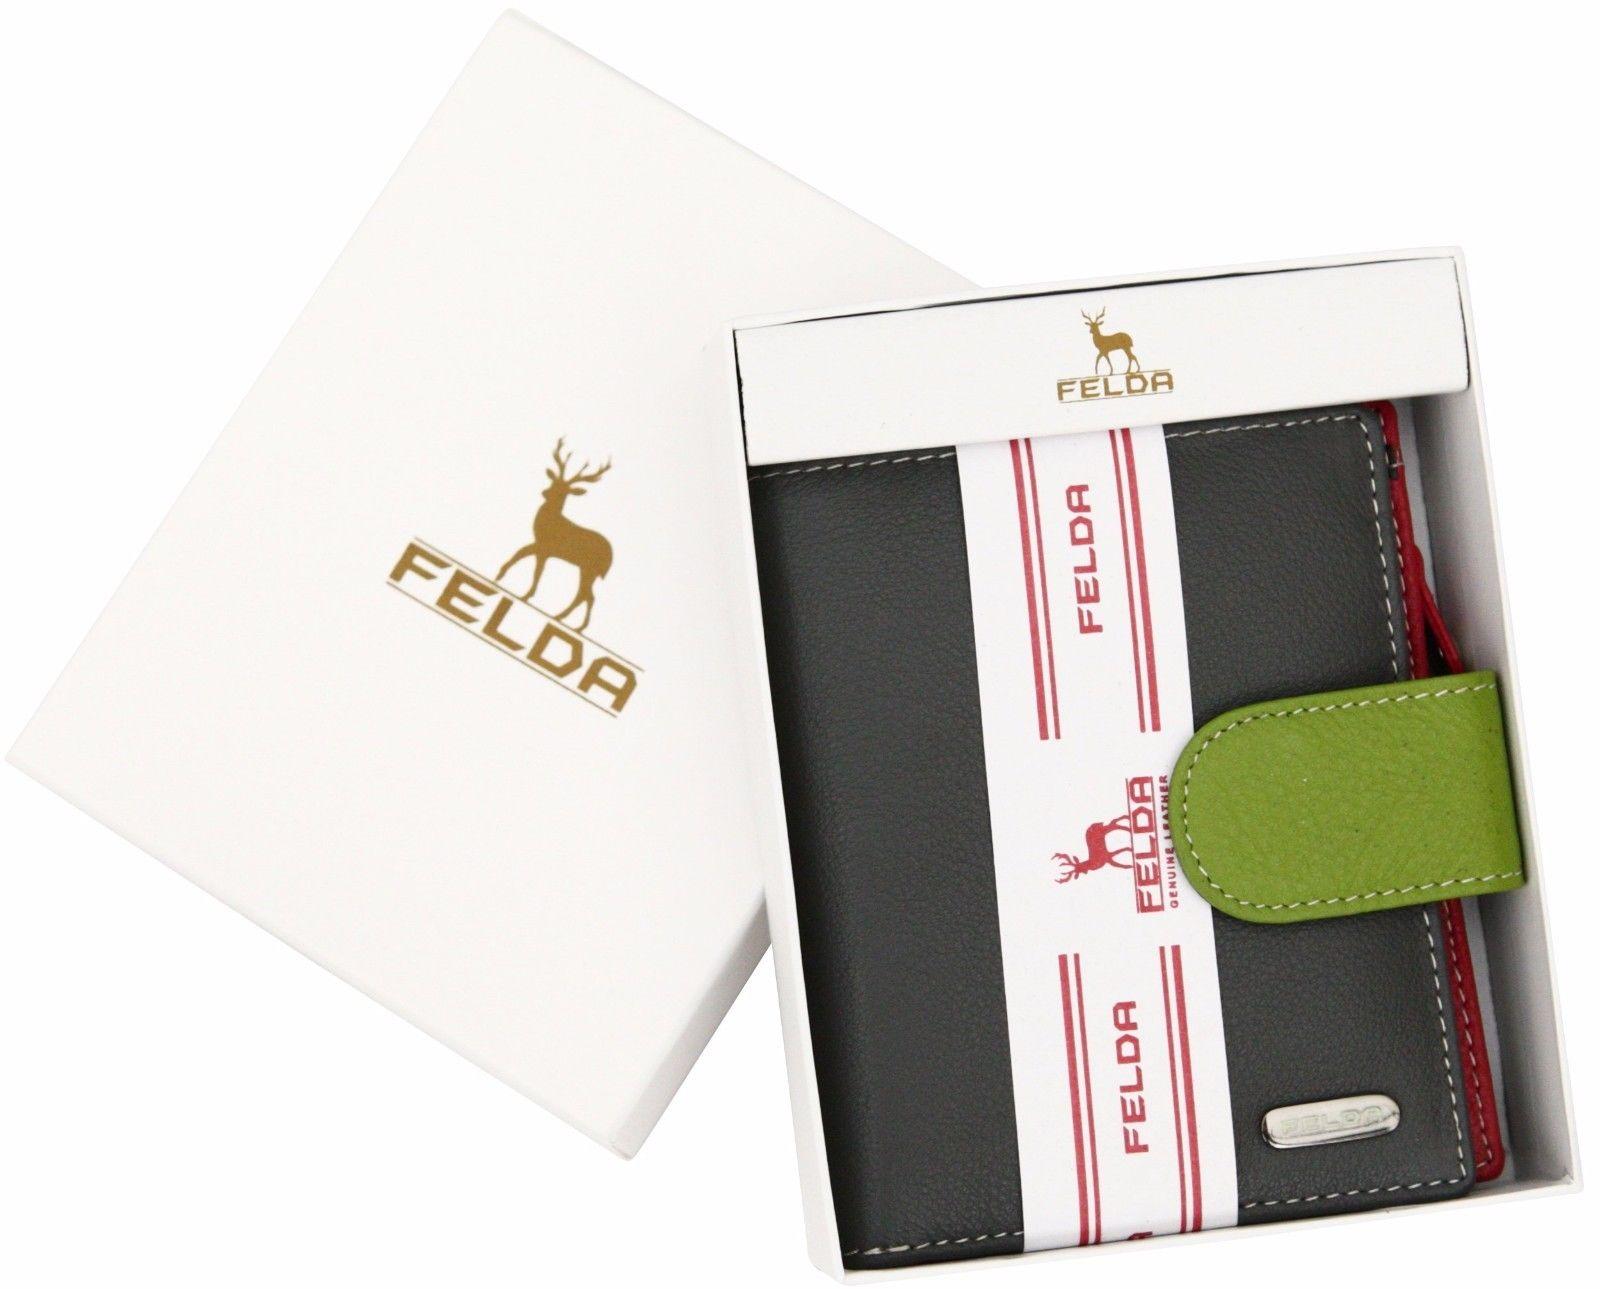 Felda-RFID-onorevoli-MEDAGLIA-amp-Card-Purse-Wallet-Genuine-Leather-Multi-SOFT-BOX-REGALO miniatura 37